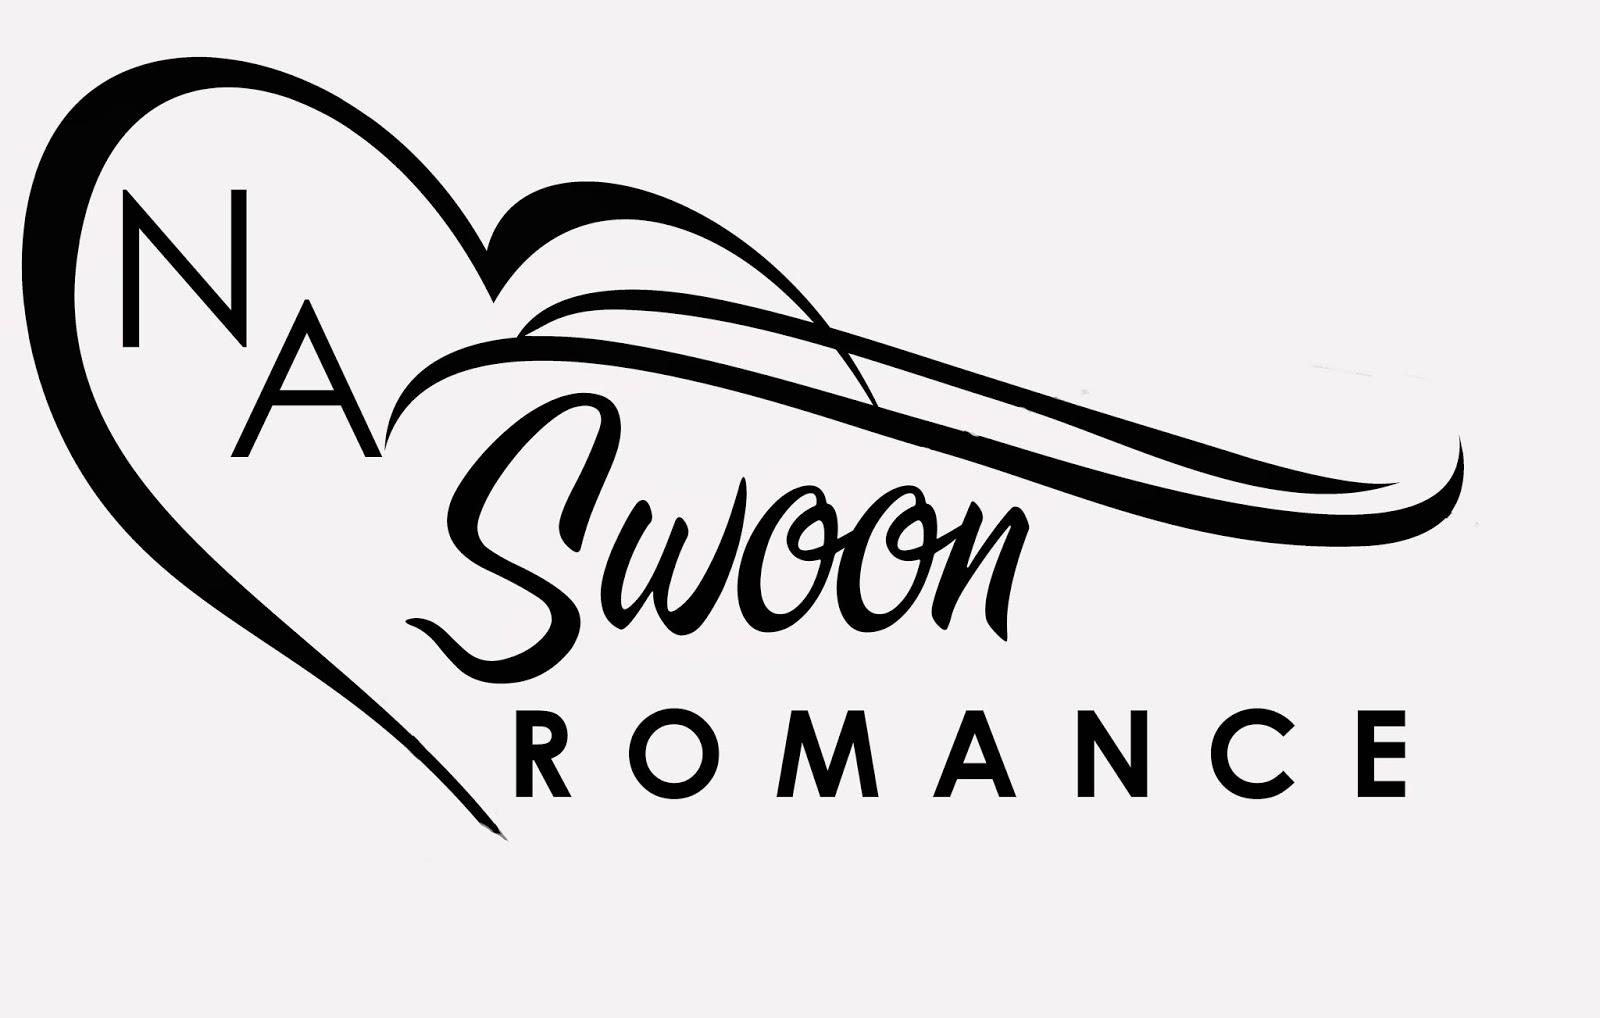 http://www.myswoonromance.com/